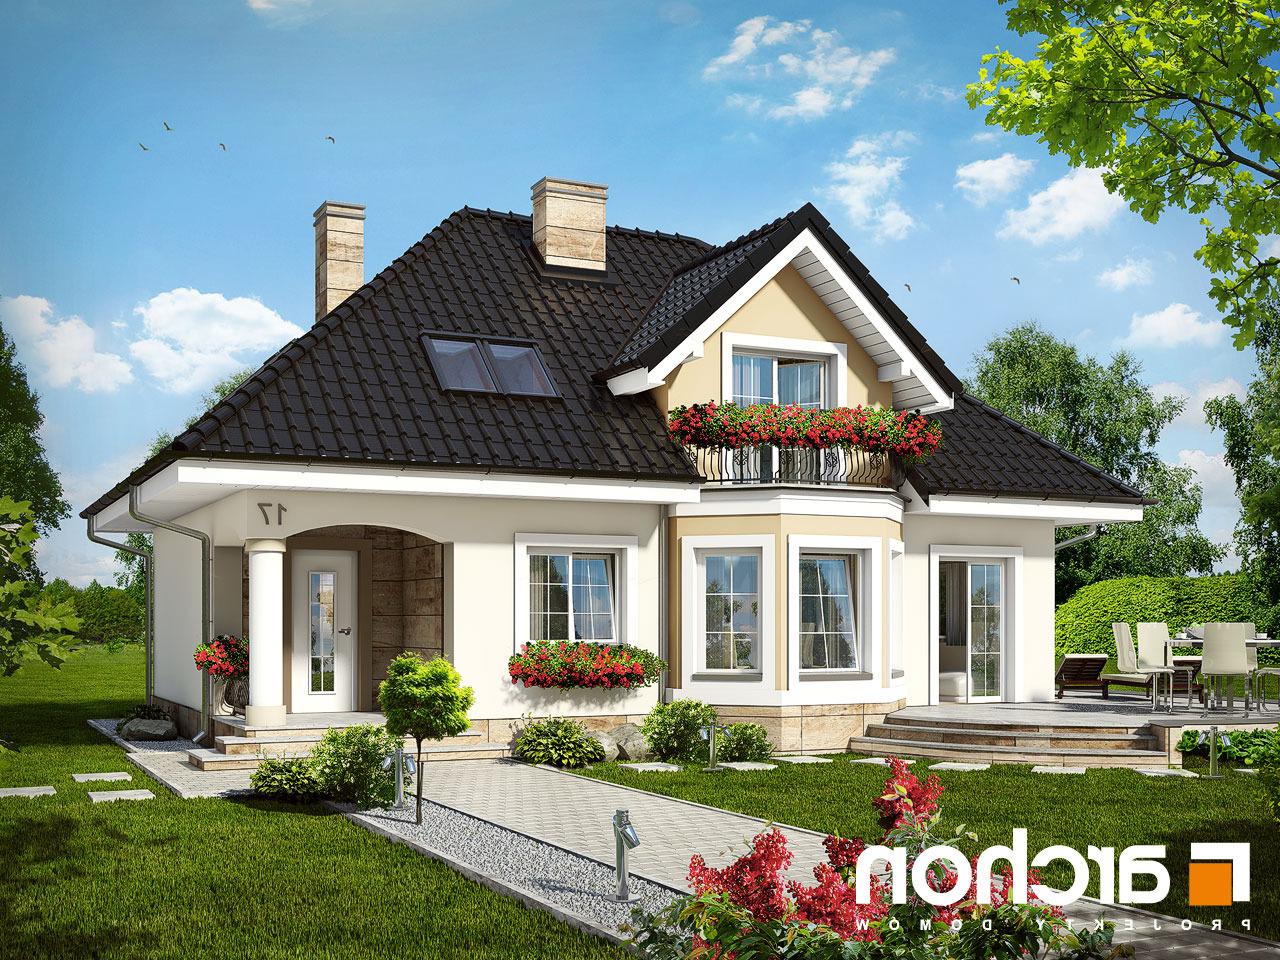 projekt domu dom w awokado ver 2 archon. Black Bedroom Furniture Sets. Home Design Ideas